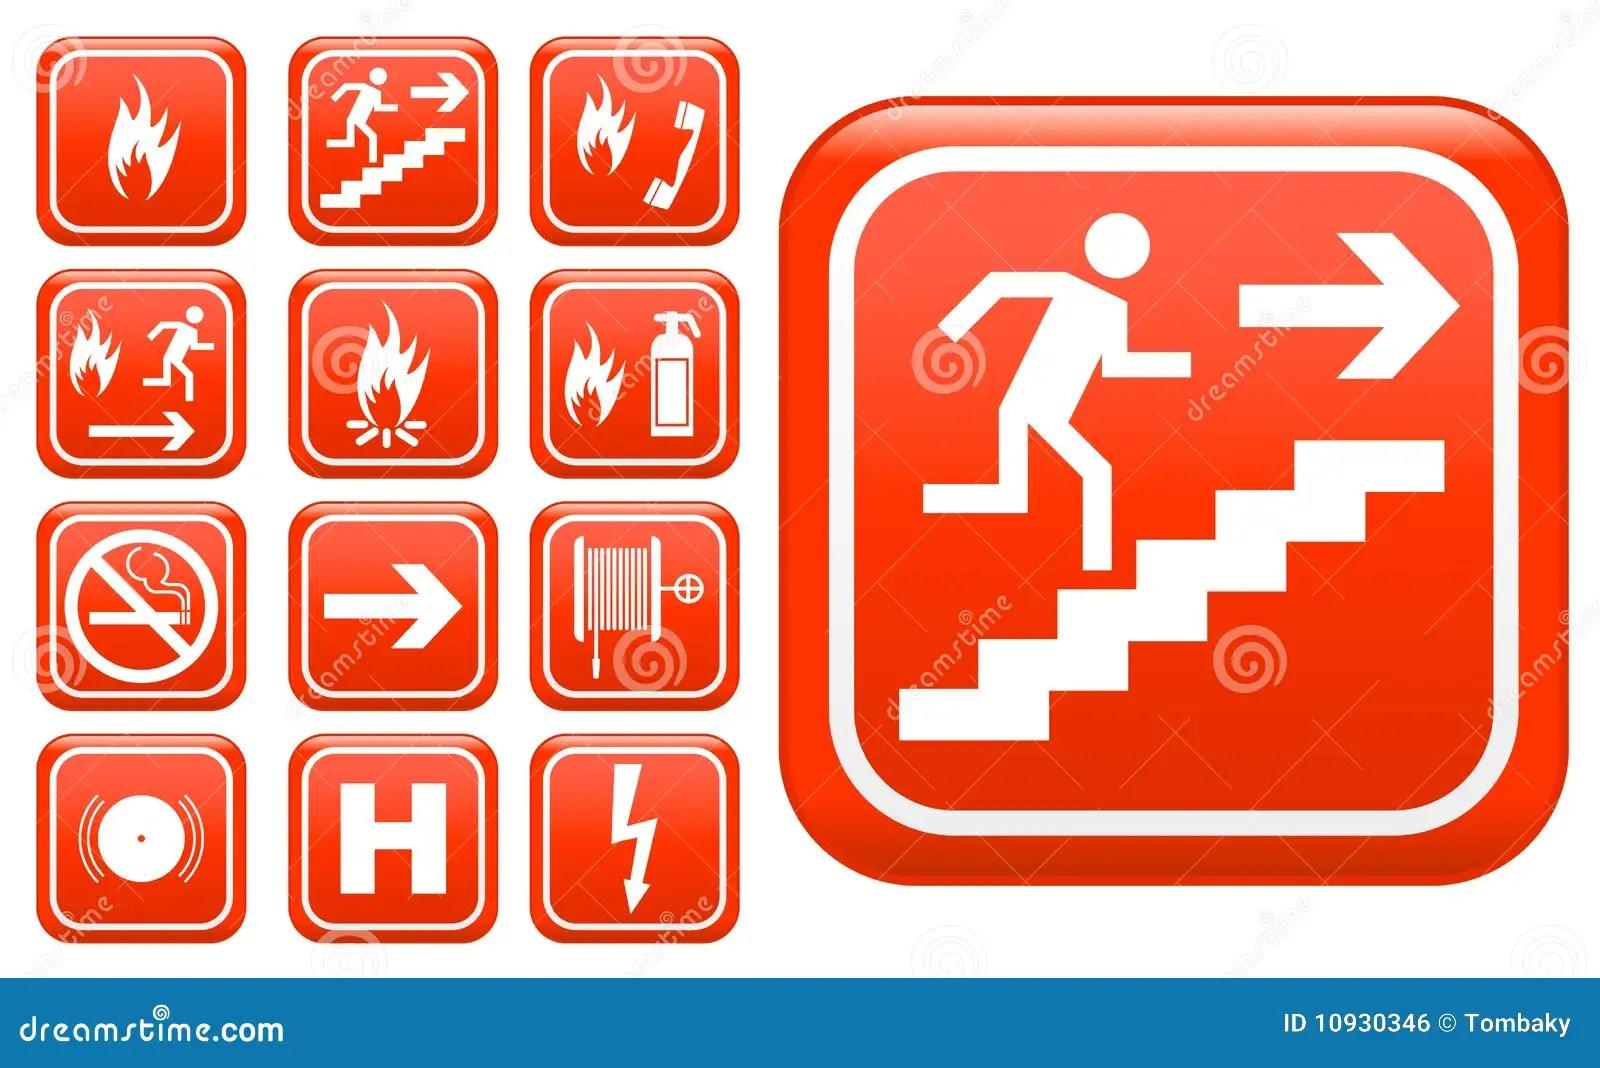 ed emergency fire safety